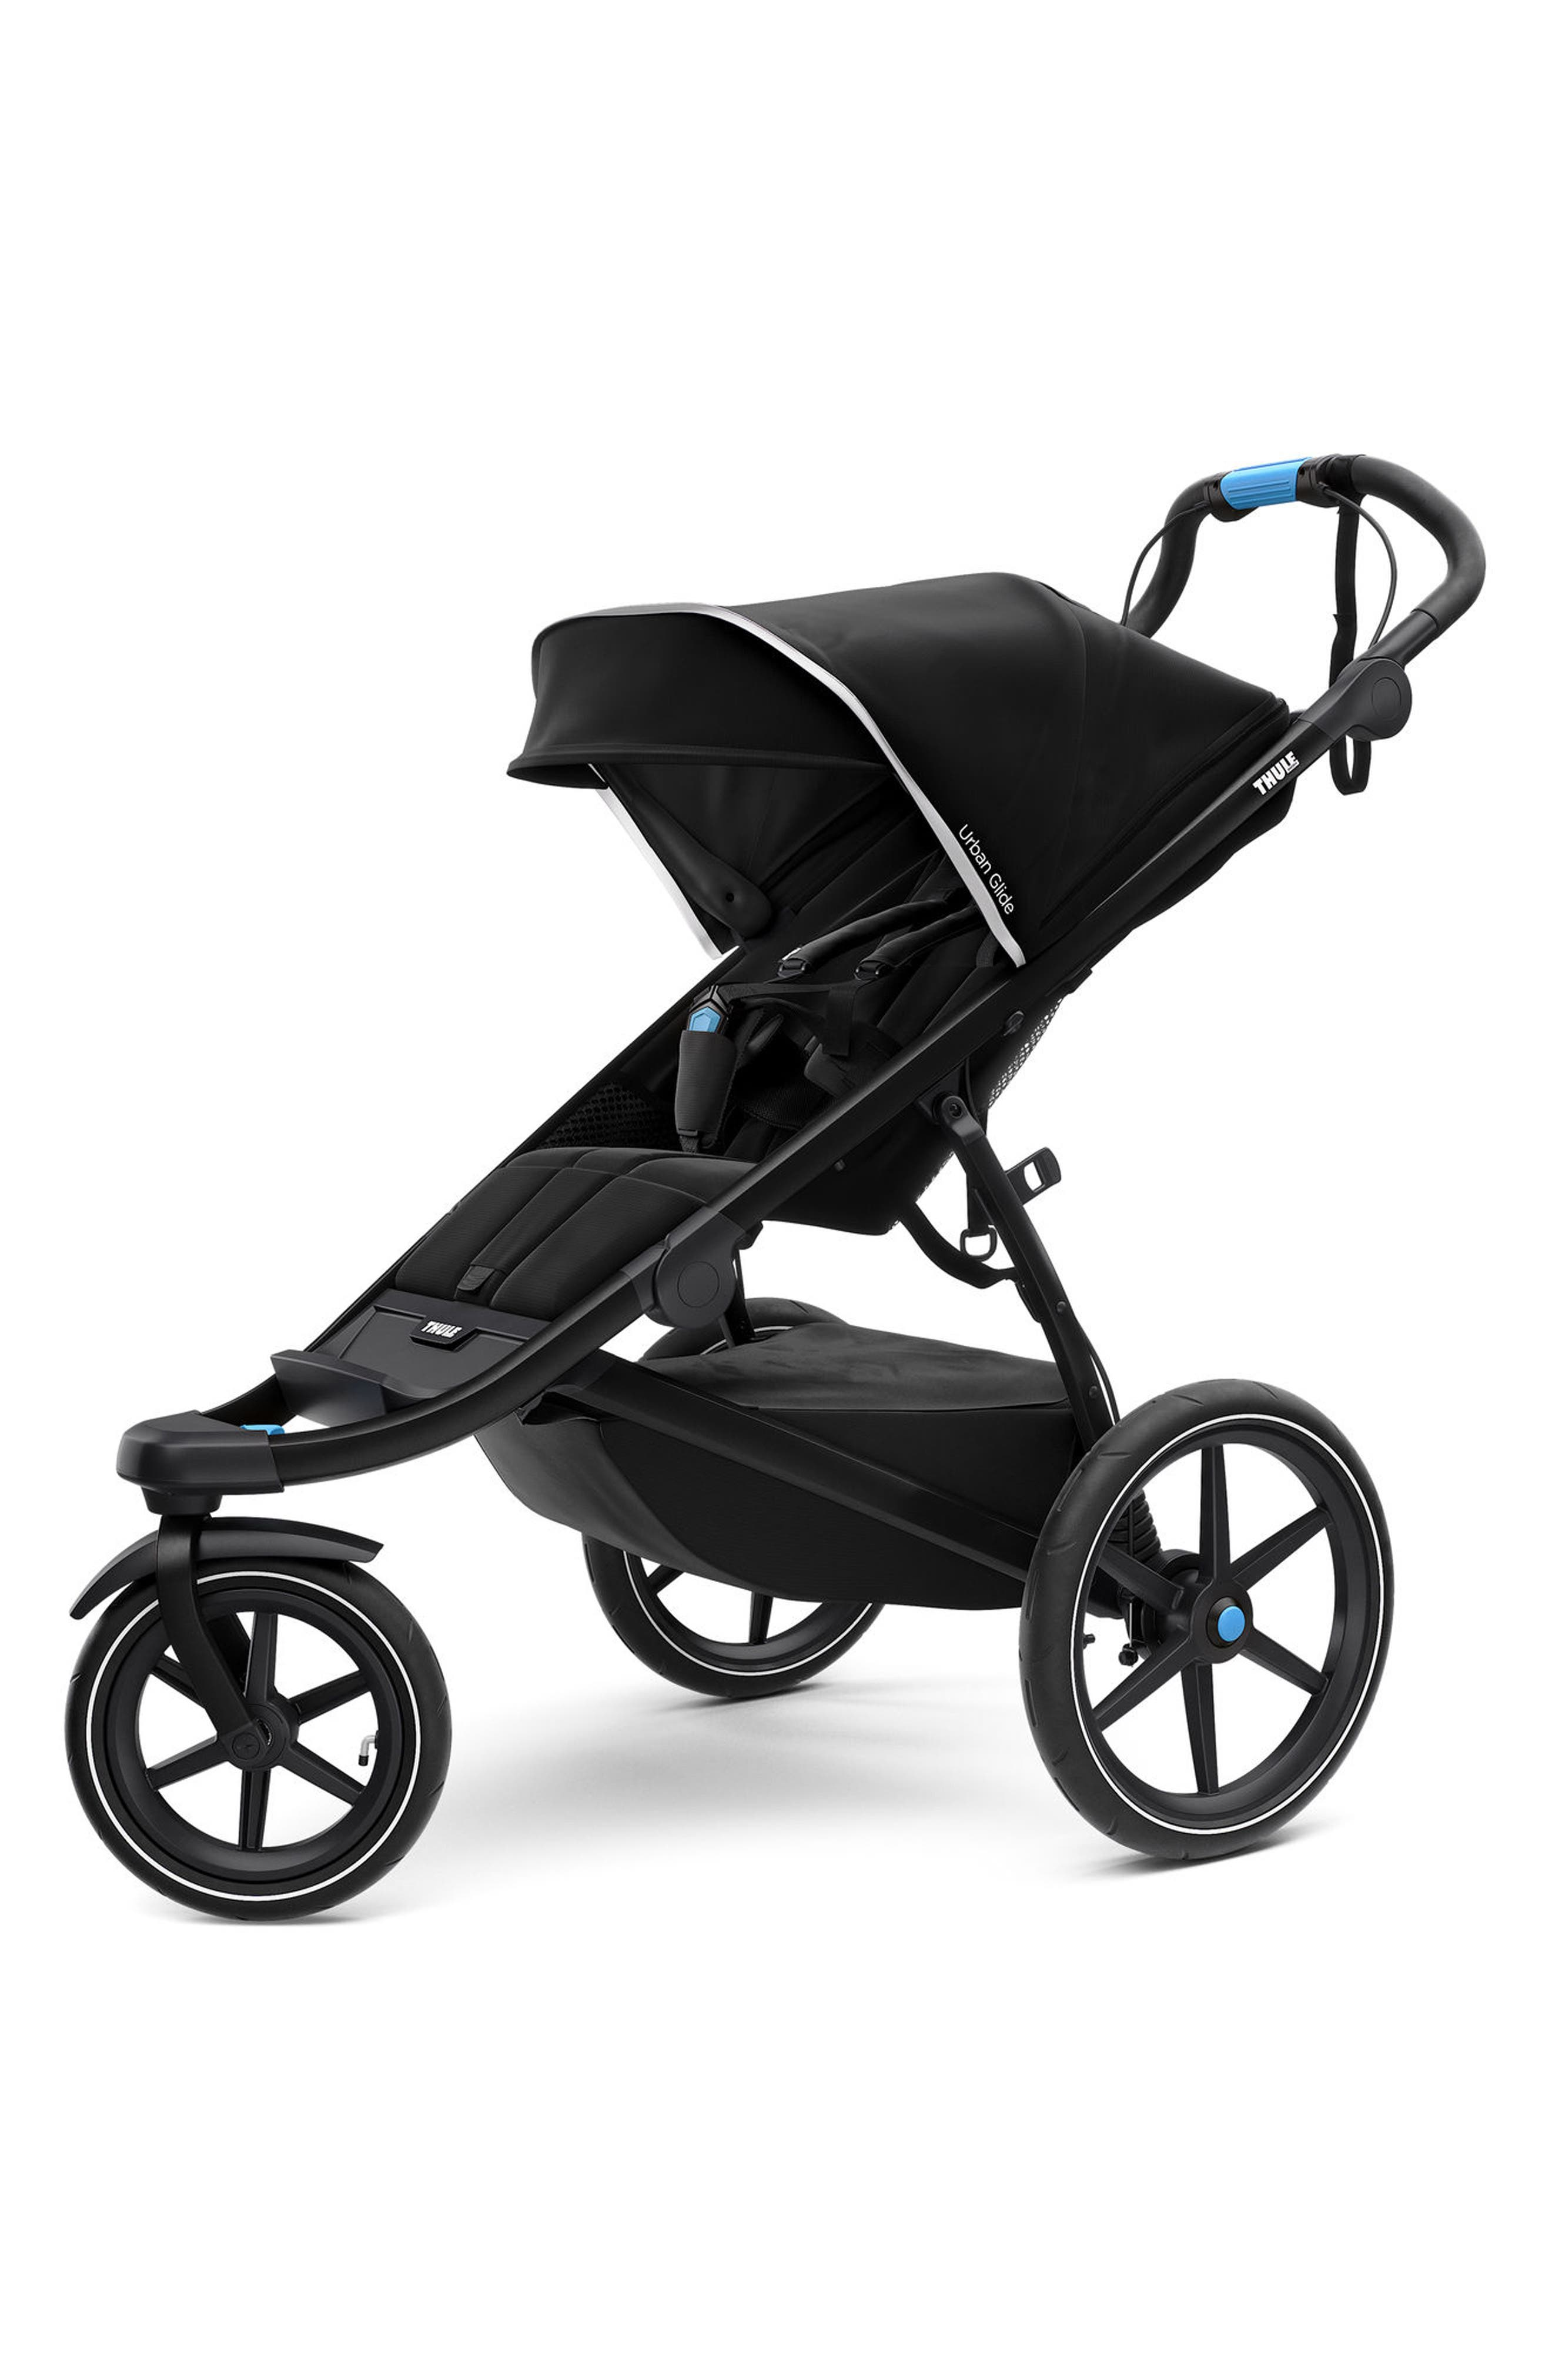 THULE Urban Glide 2 Jogging Stroller with Black Frame, Main, color, 006